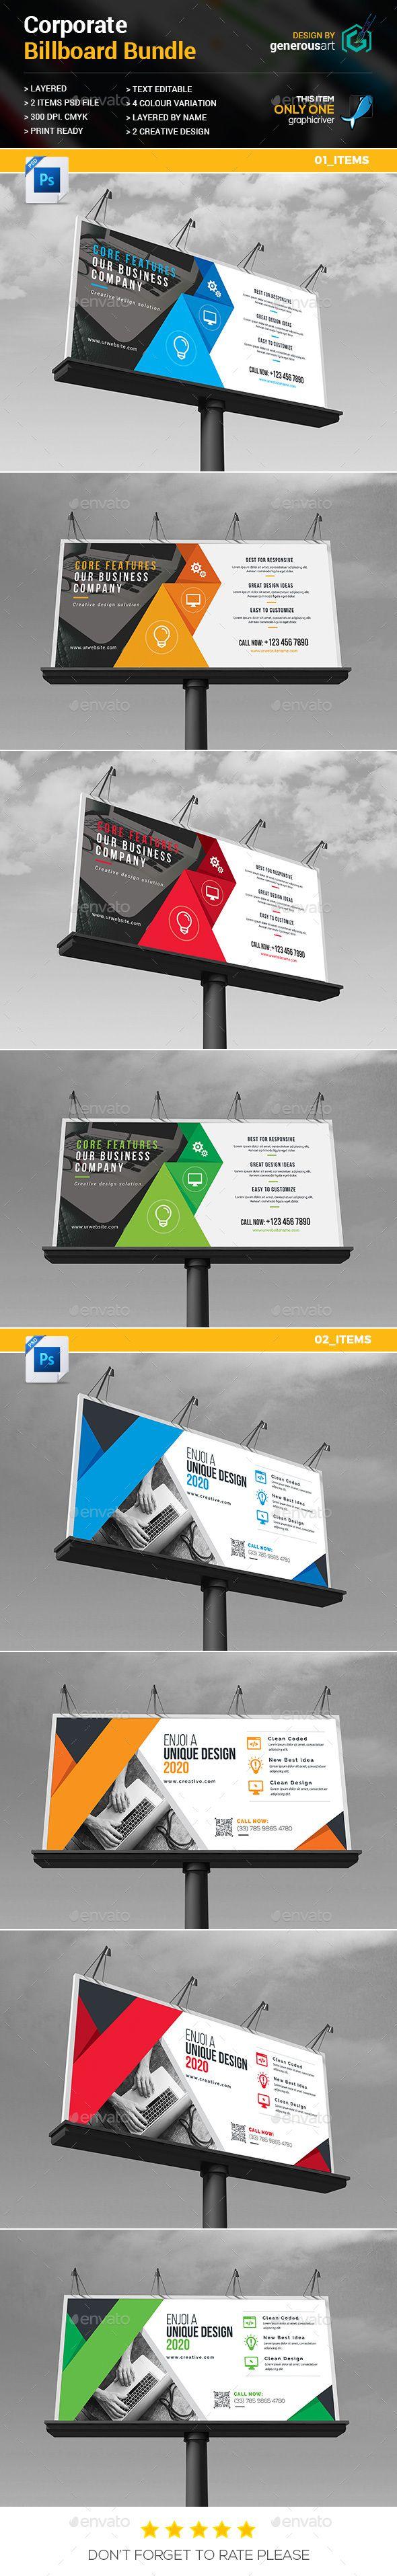 Poster design rates - Billboard Template Bundle_2 In 1